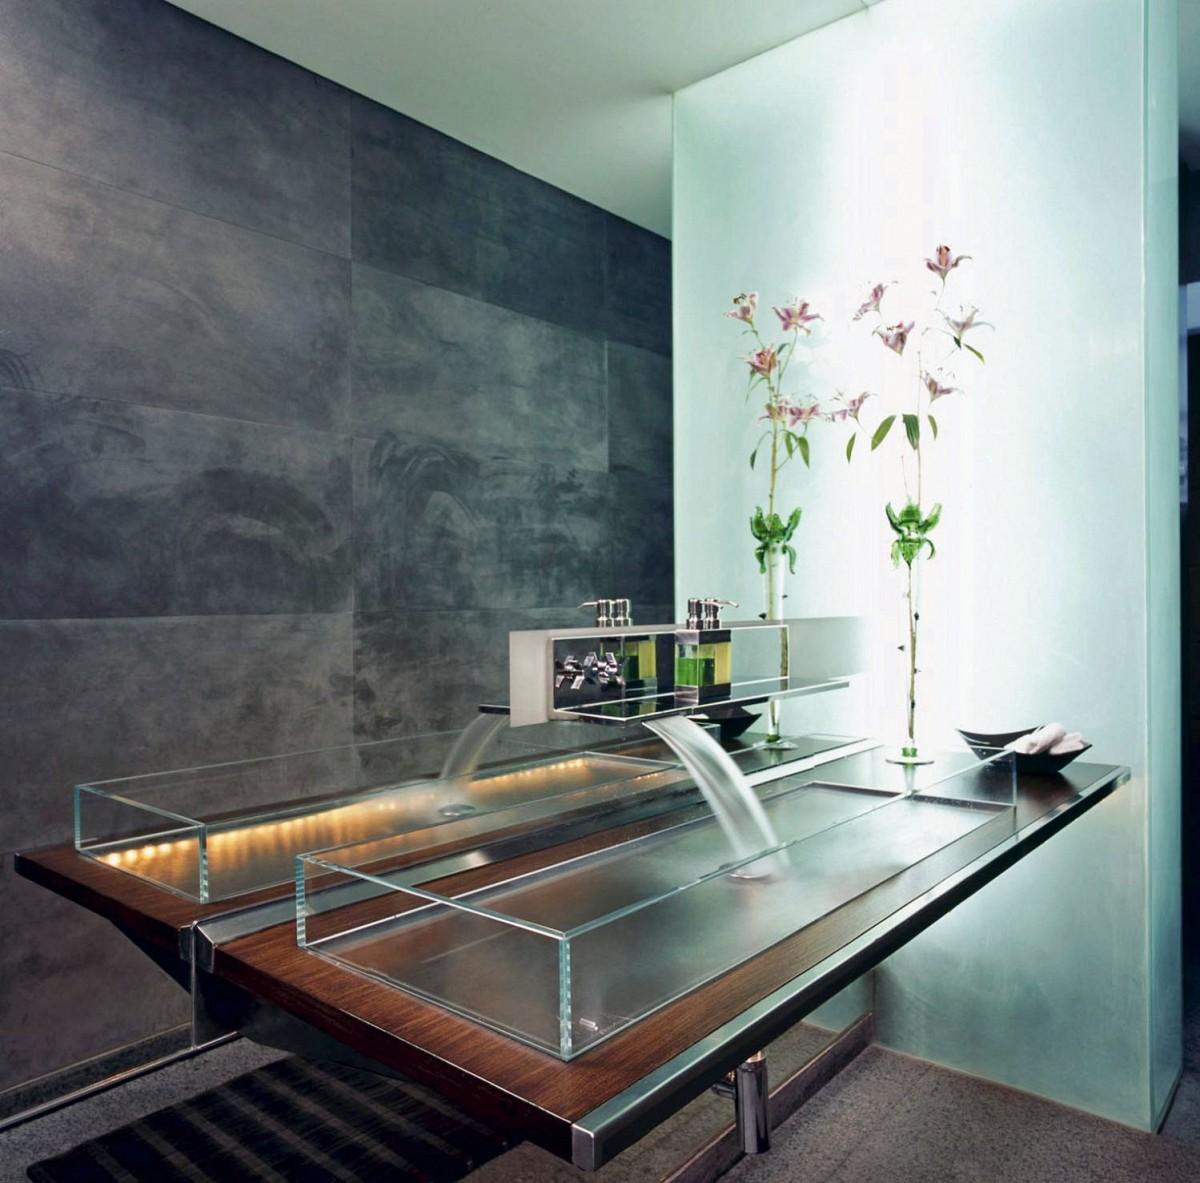 lavabo de bao hecho de cristal en forma de cascada